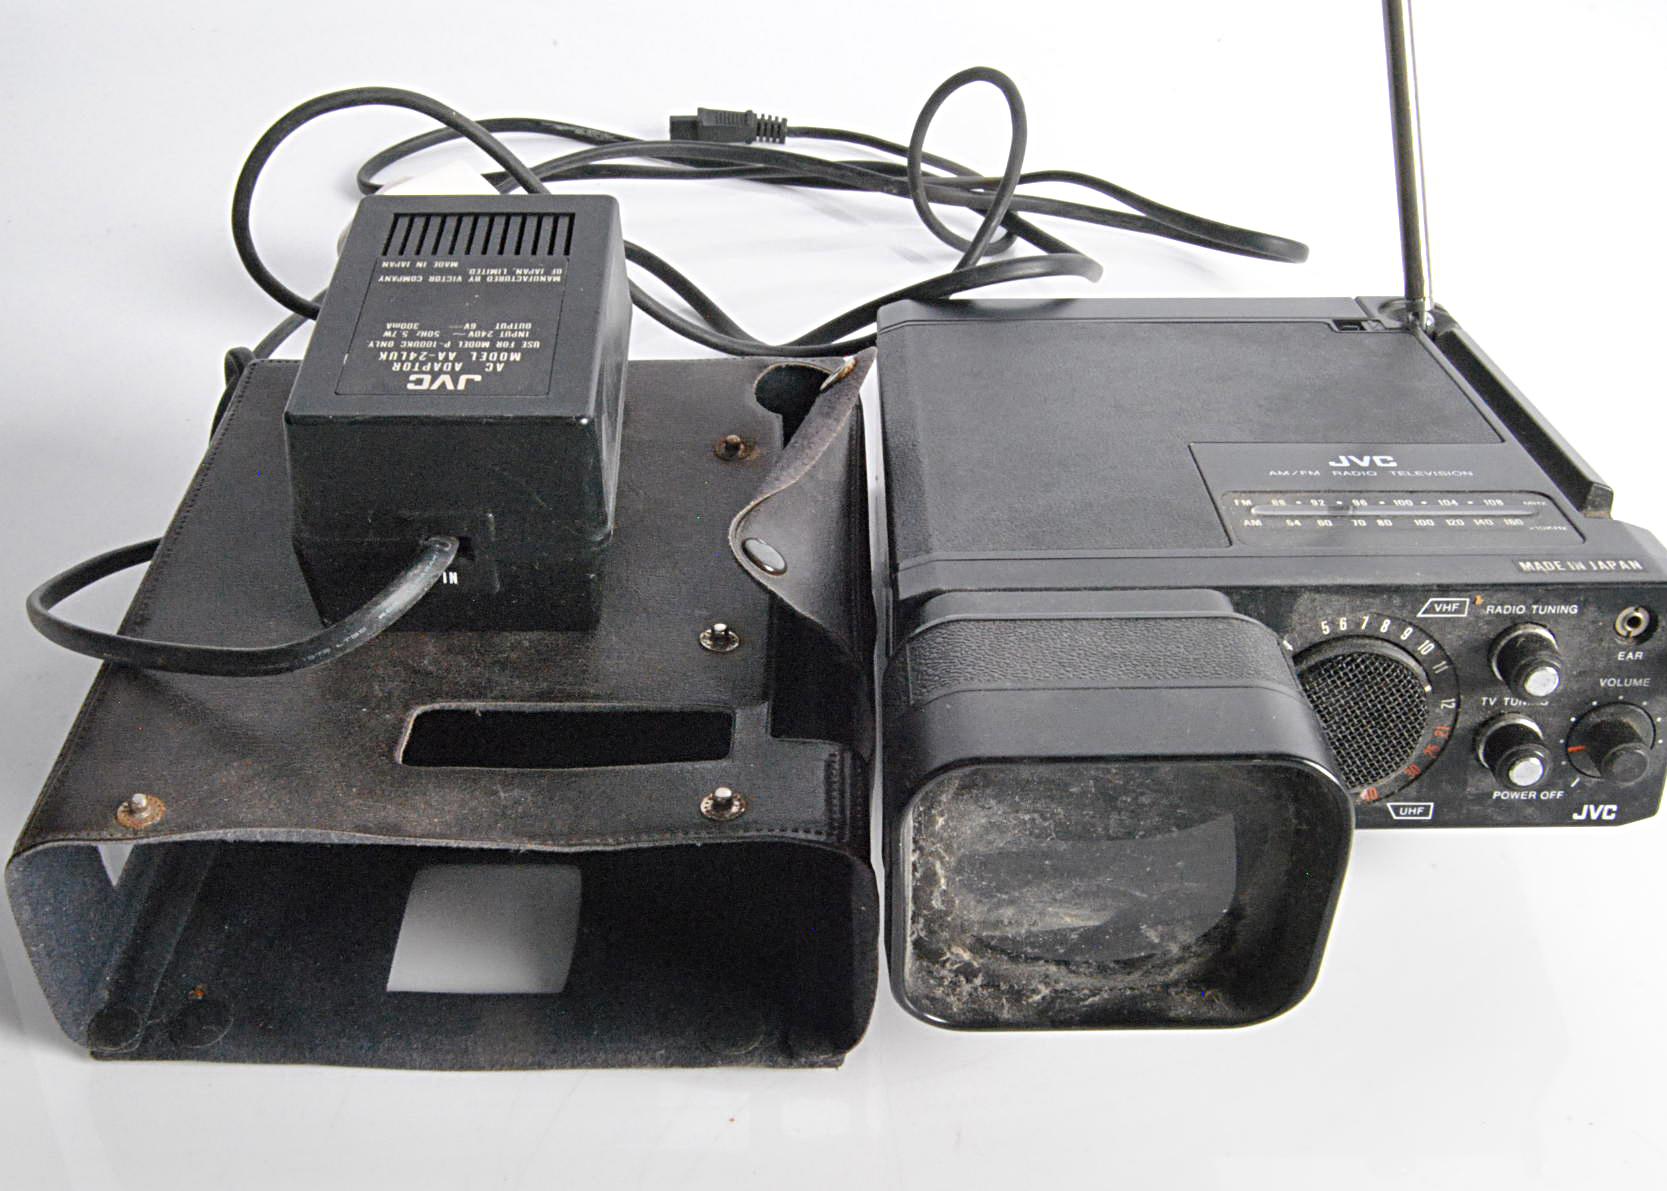 JVC Portable TV / Radio, JVC model P-100UKC Portable Television / Radio - with original leather